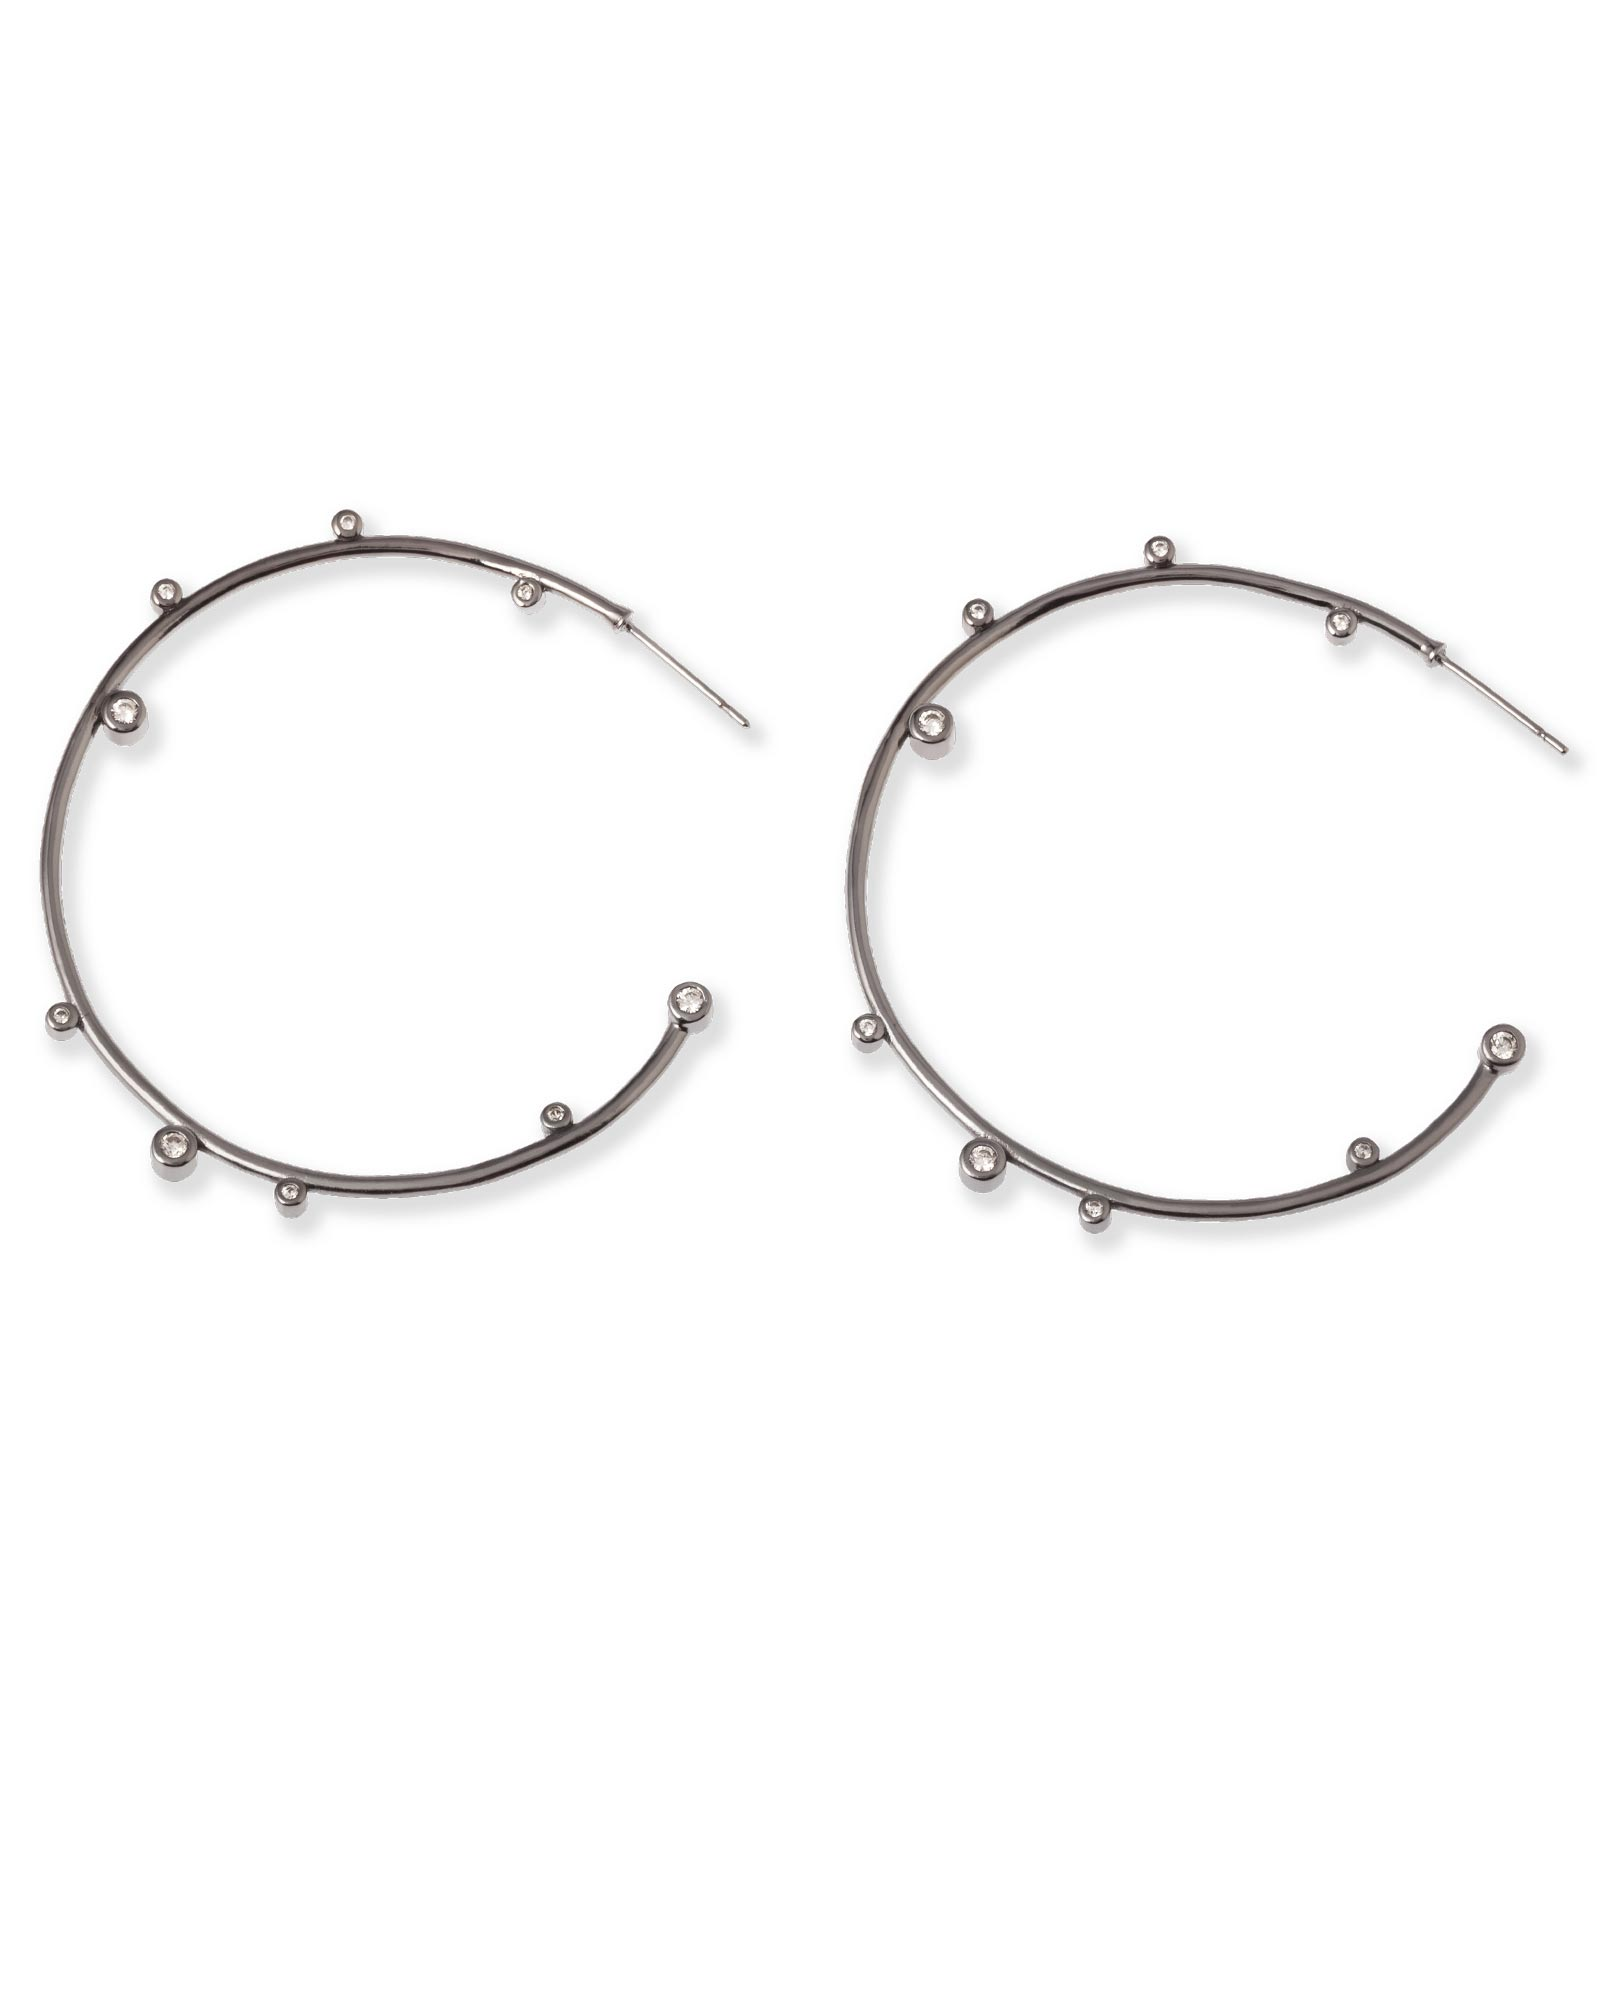 2c238b44e Lety Crystal Hoop Earrings in Hematite | Kendra Scott